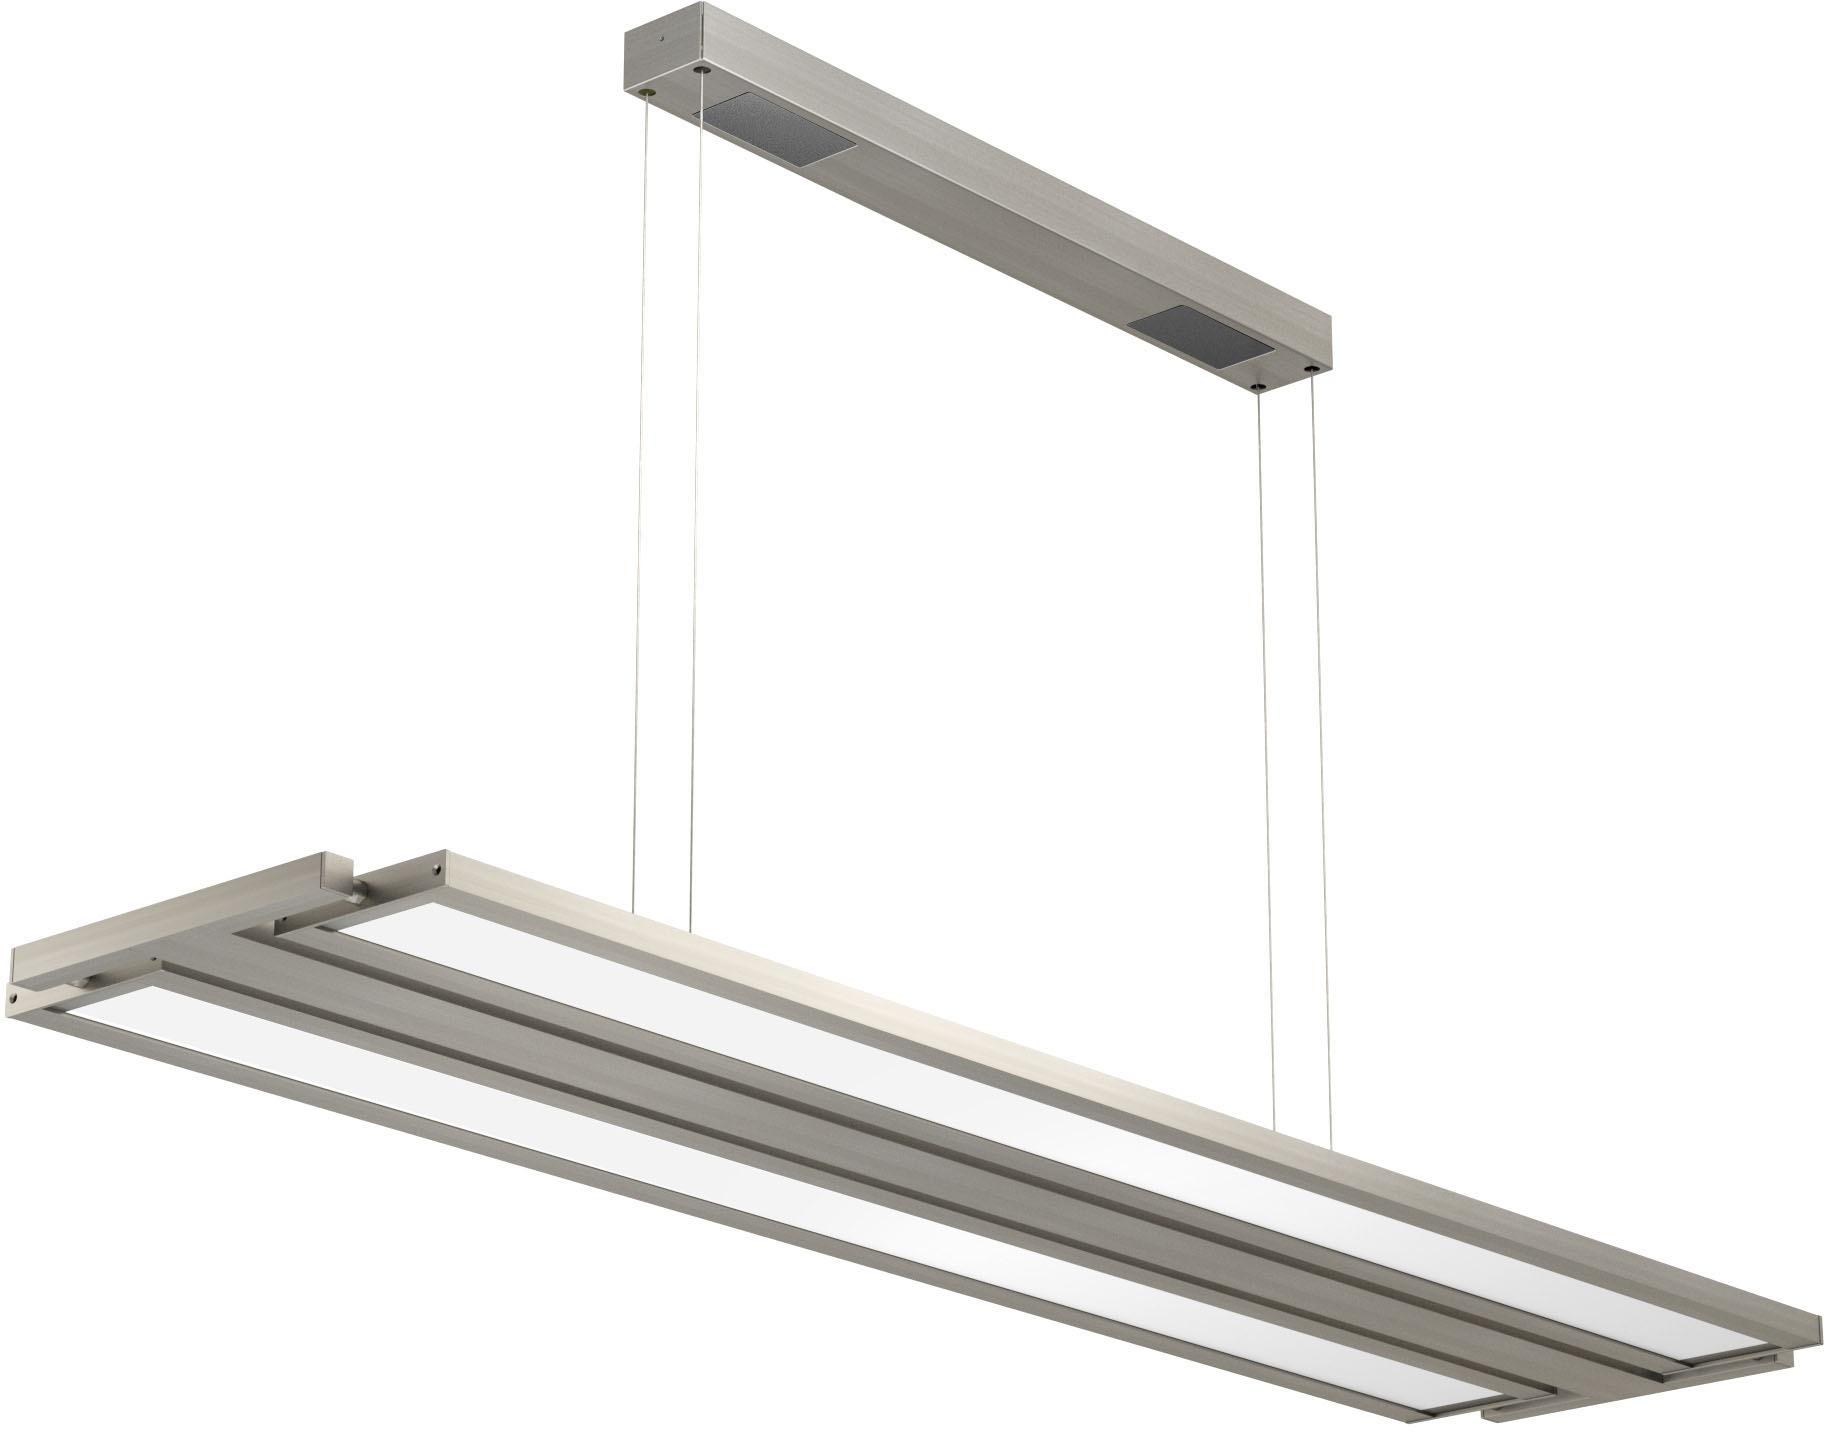 EVOTEC LED Pendelleuchte CLASSIC TEC TURN, LED-Board, LED Hängelampe, LED Hängeleuchte, Farbwechsel